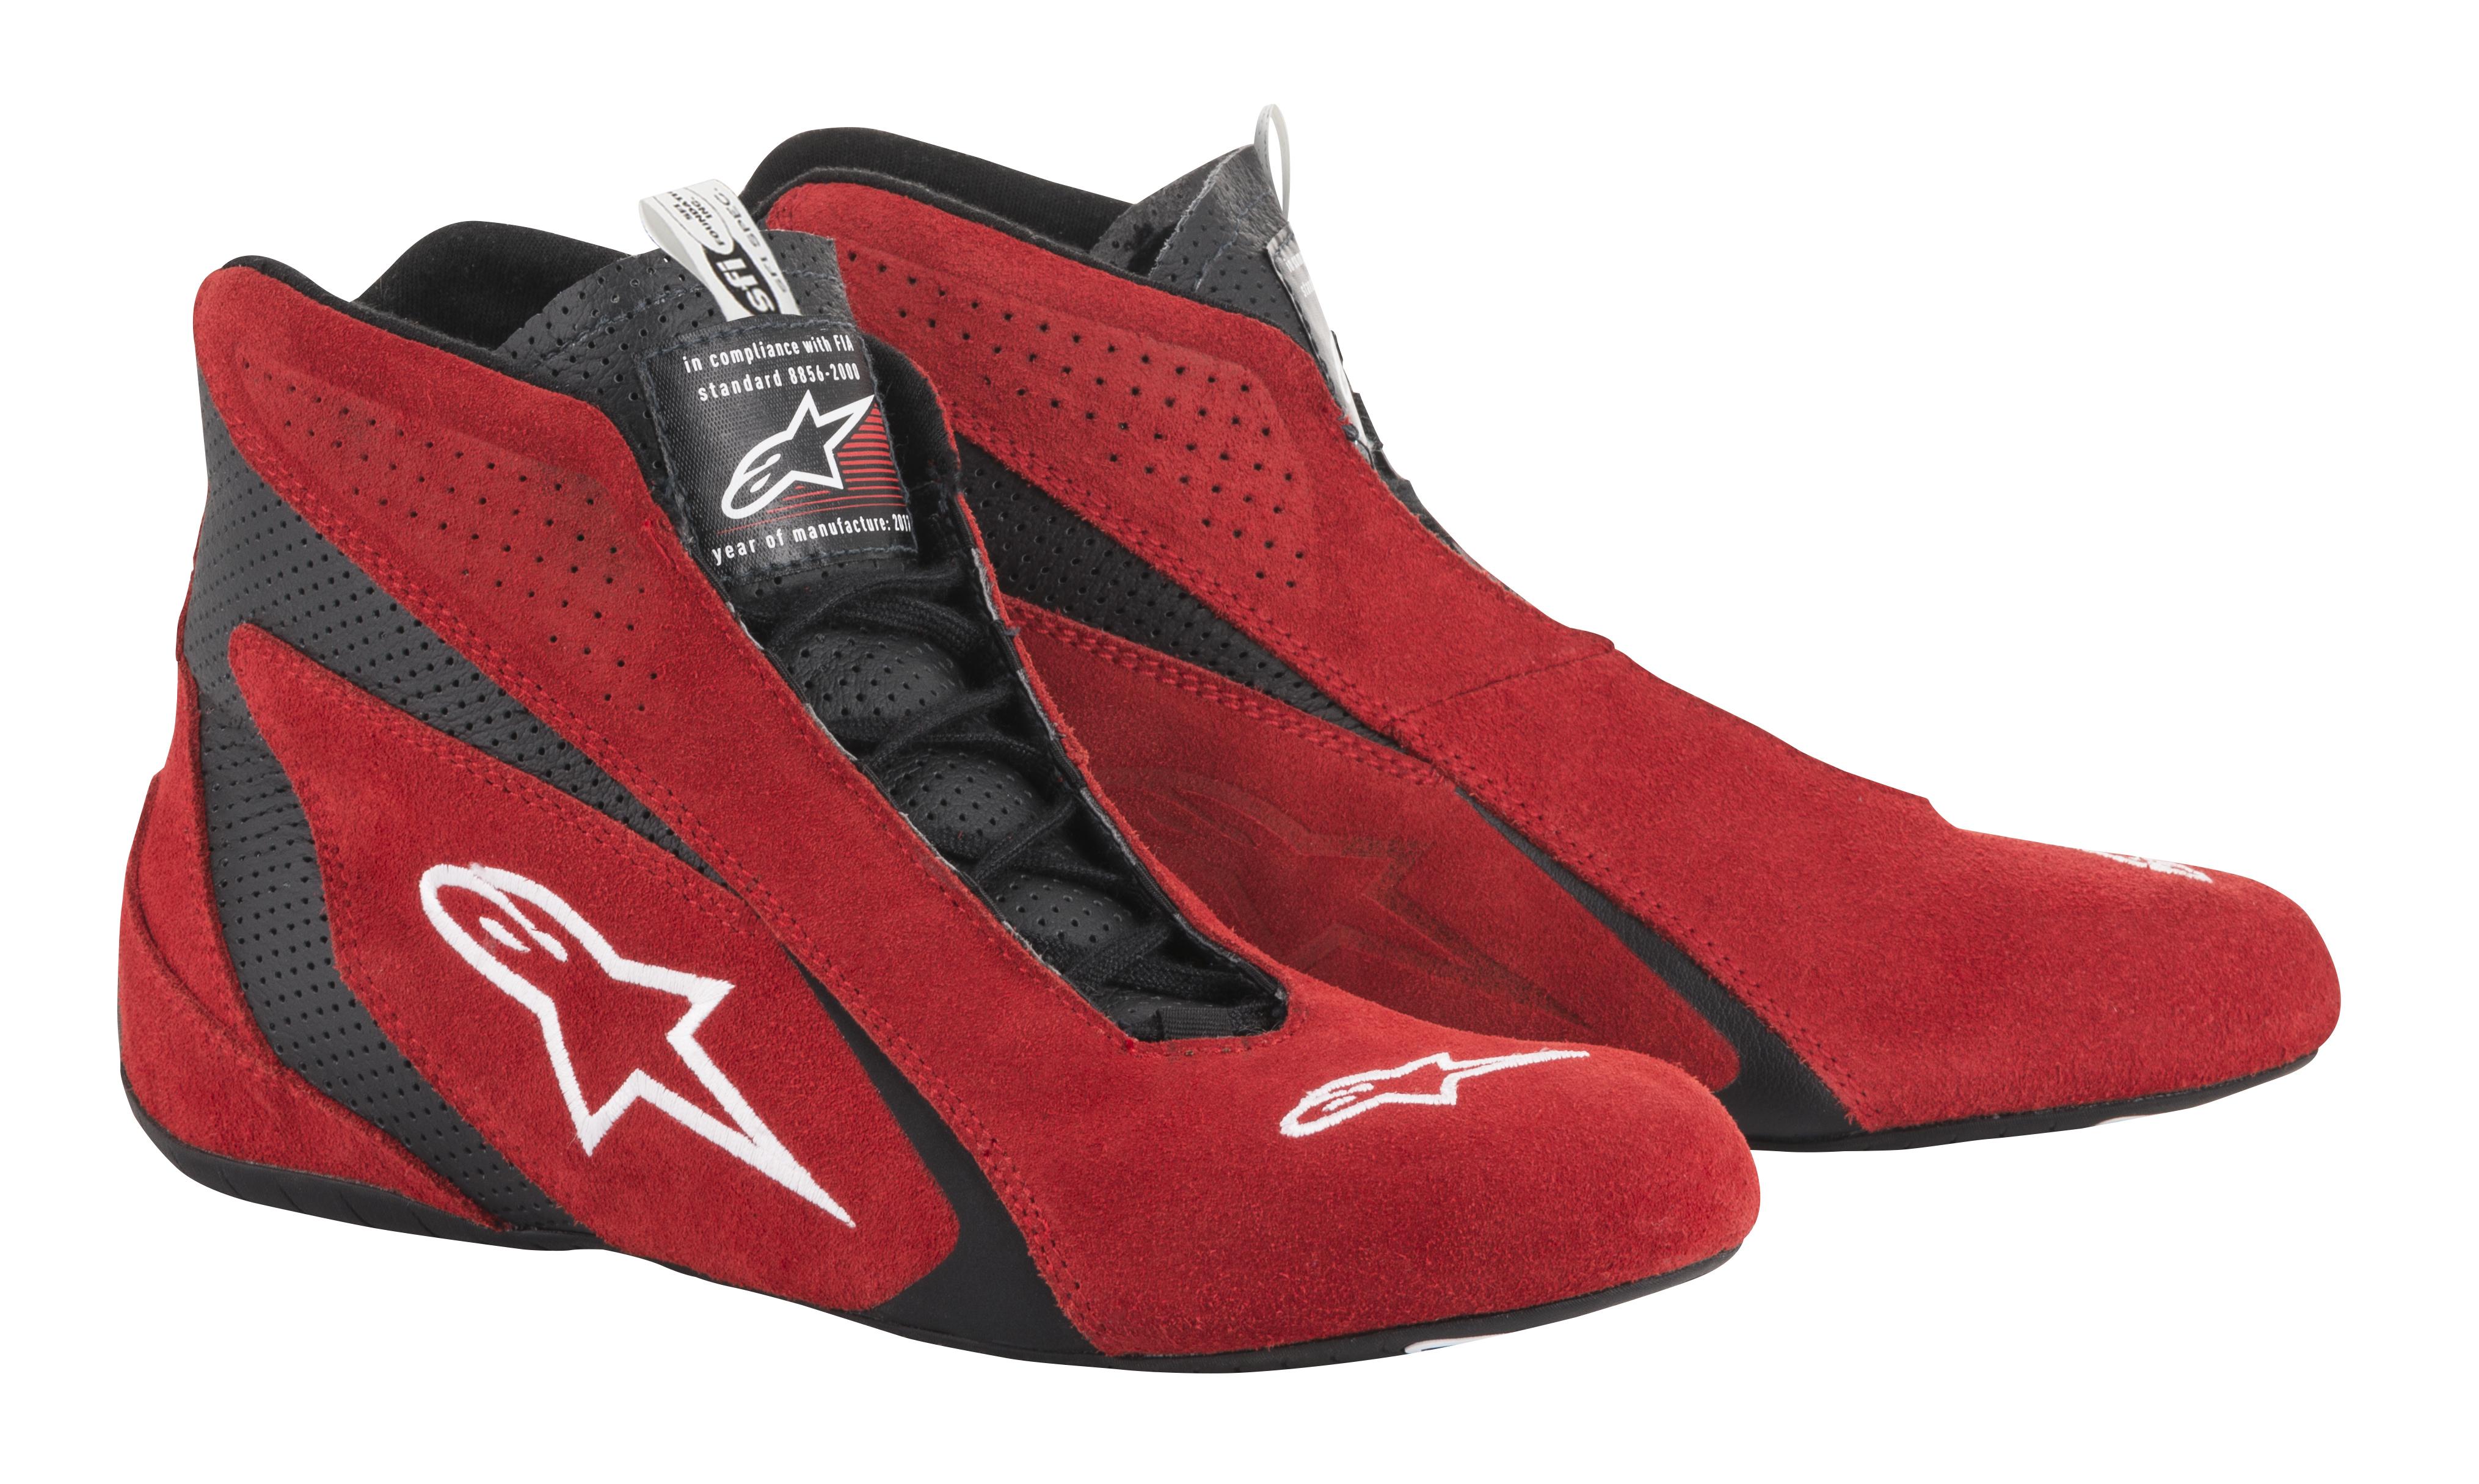 Alpinestars Usa SP Shoe Red Size 5